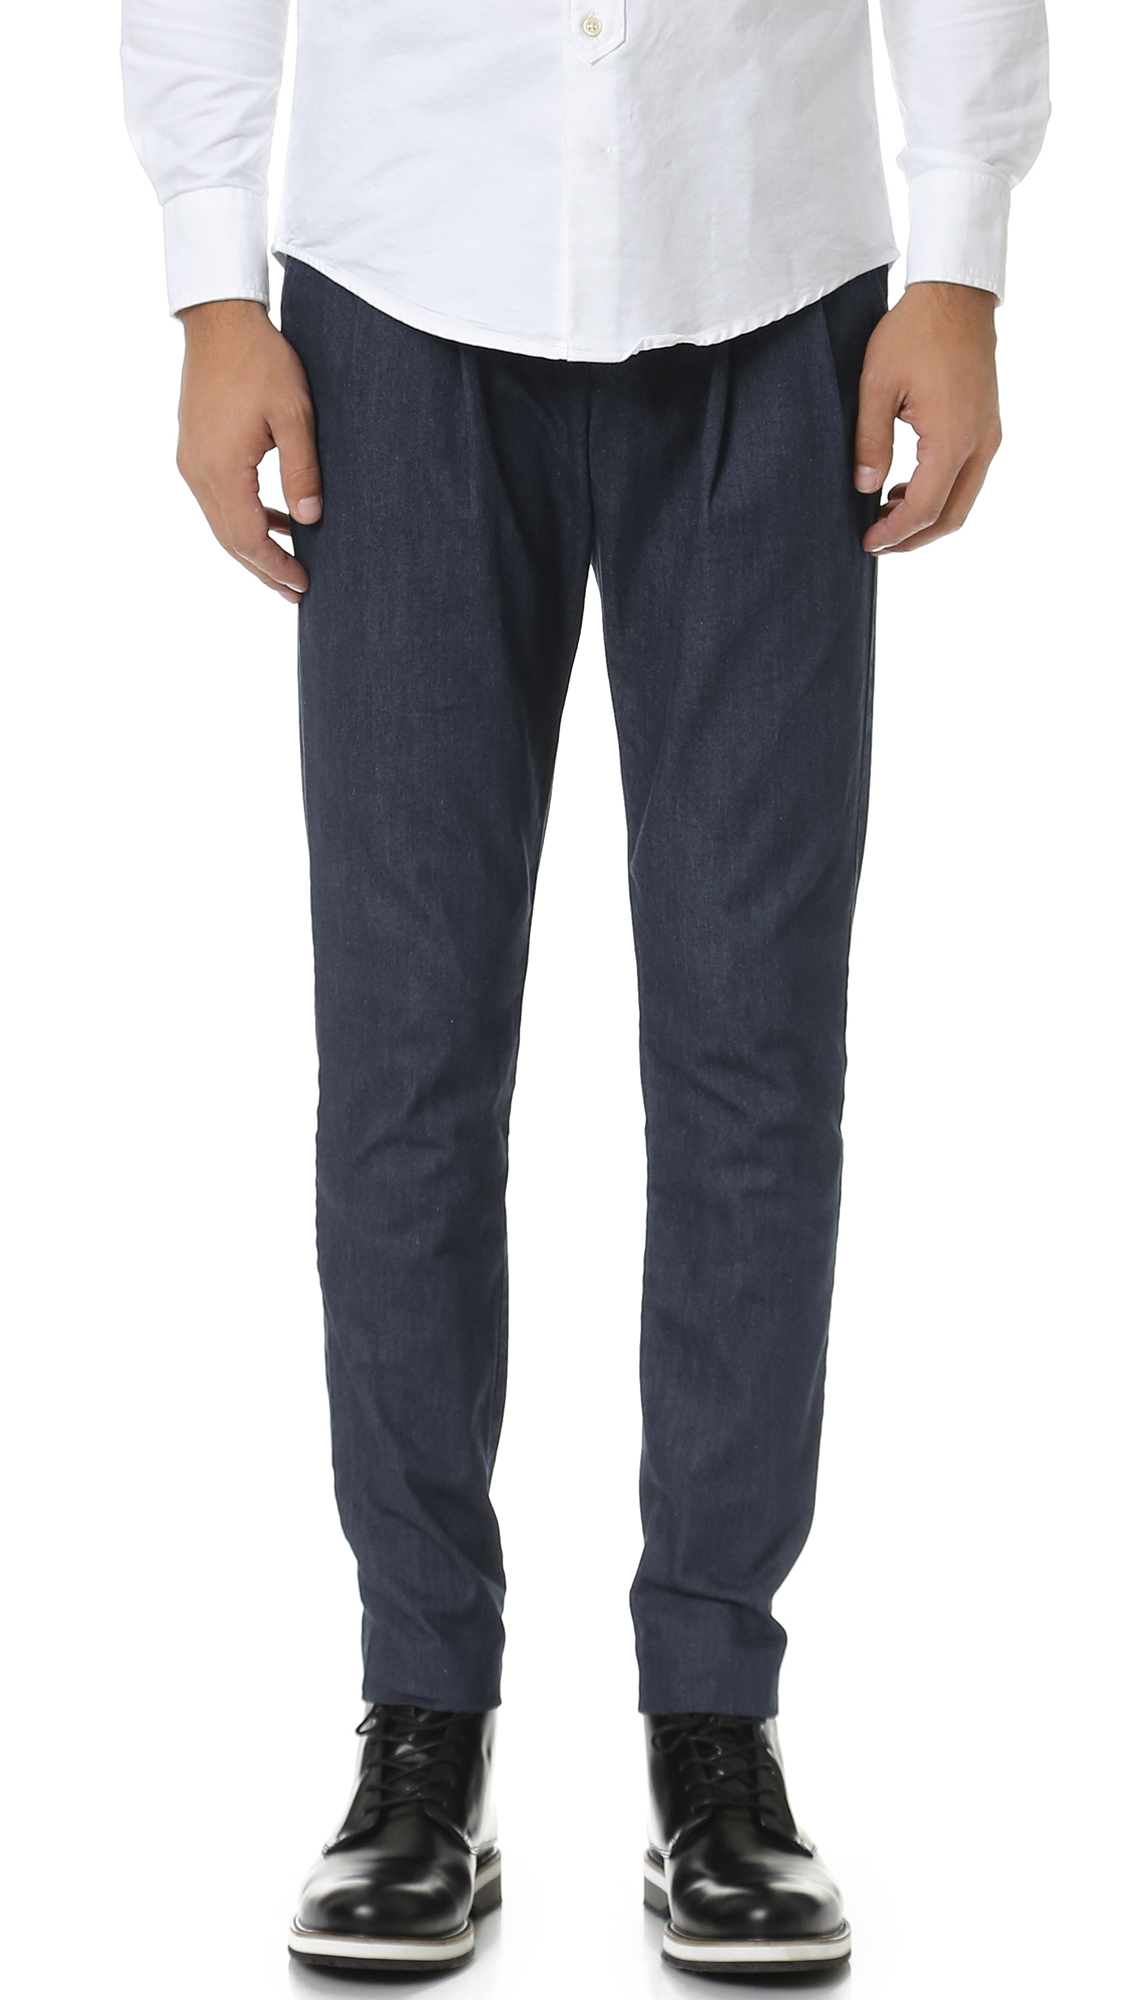 Haggar Mens Blue Jeans